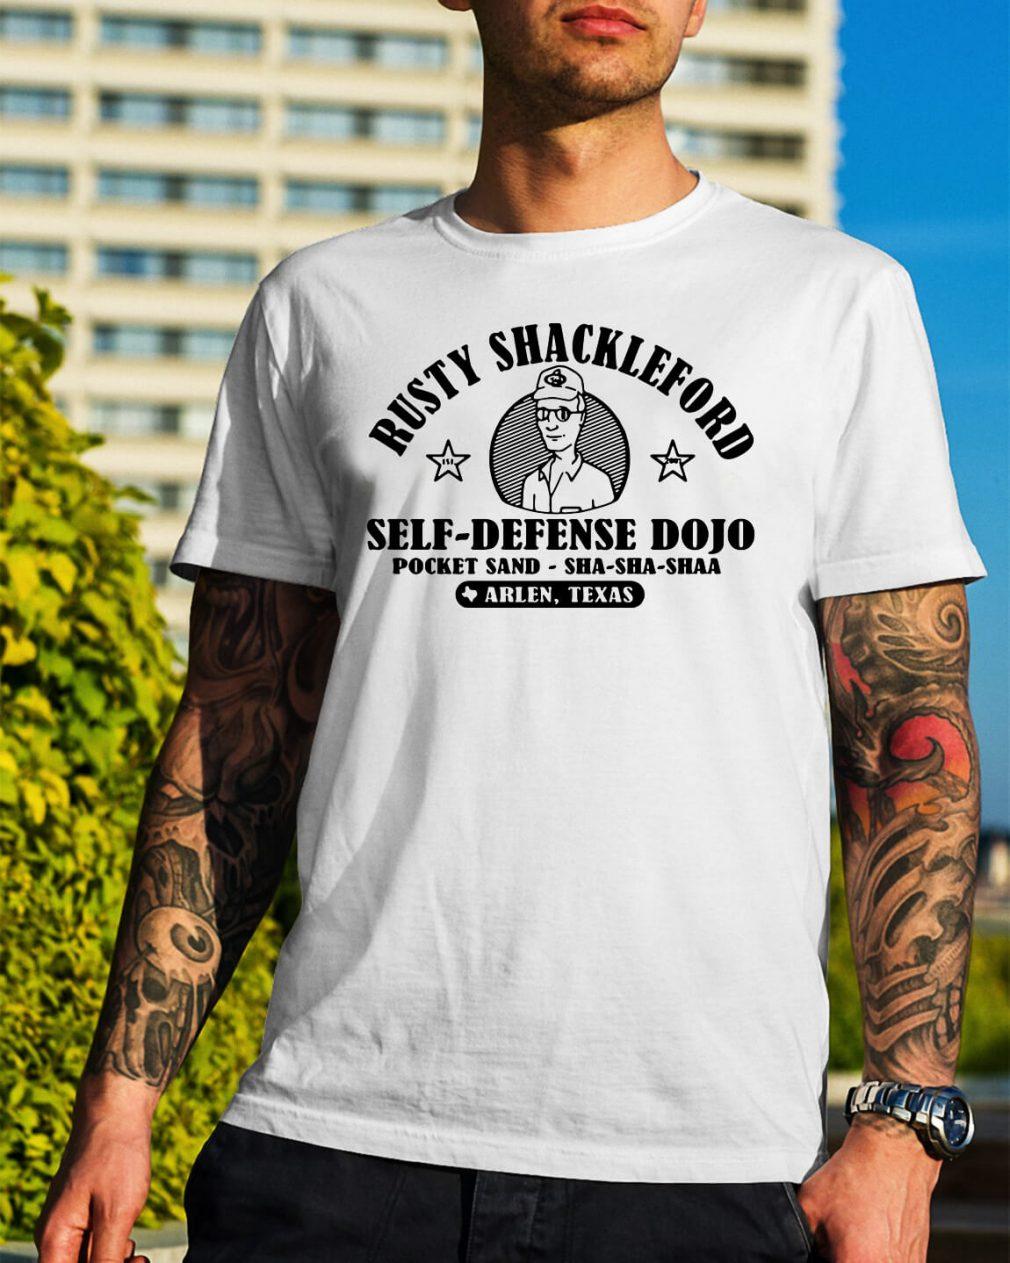 Rusty Shackleford self-defense dojo pocket sand-sha-sha-shaa shirt